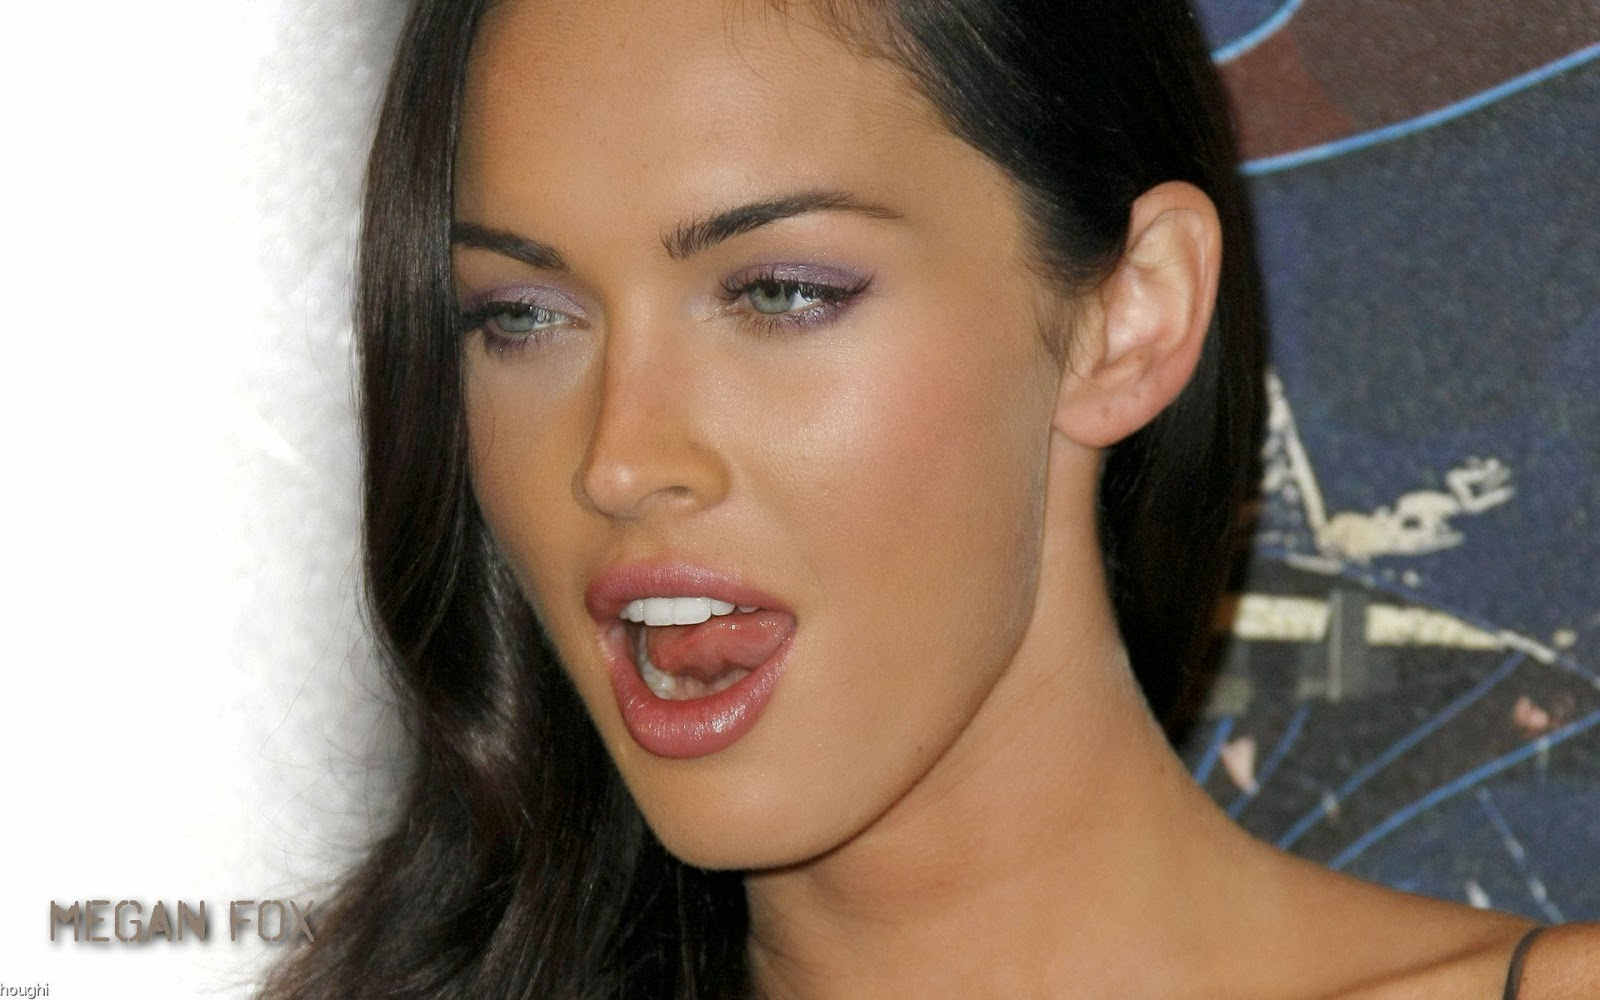 Megan Fox eye makeup